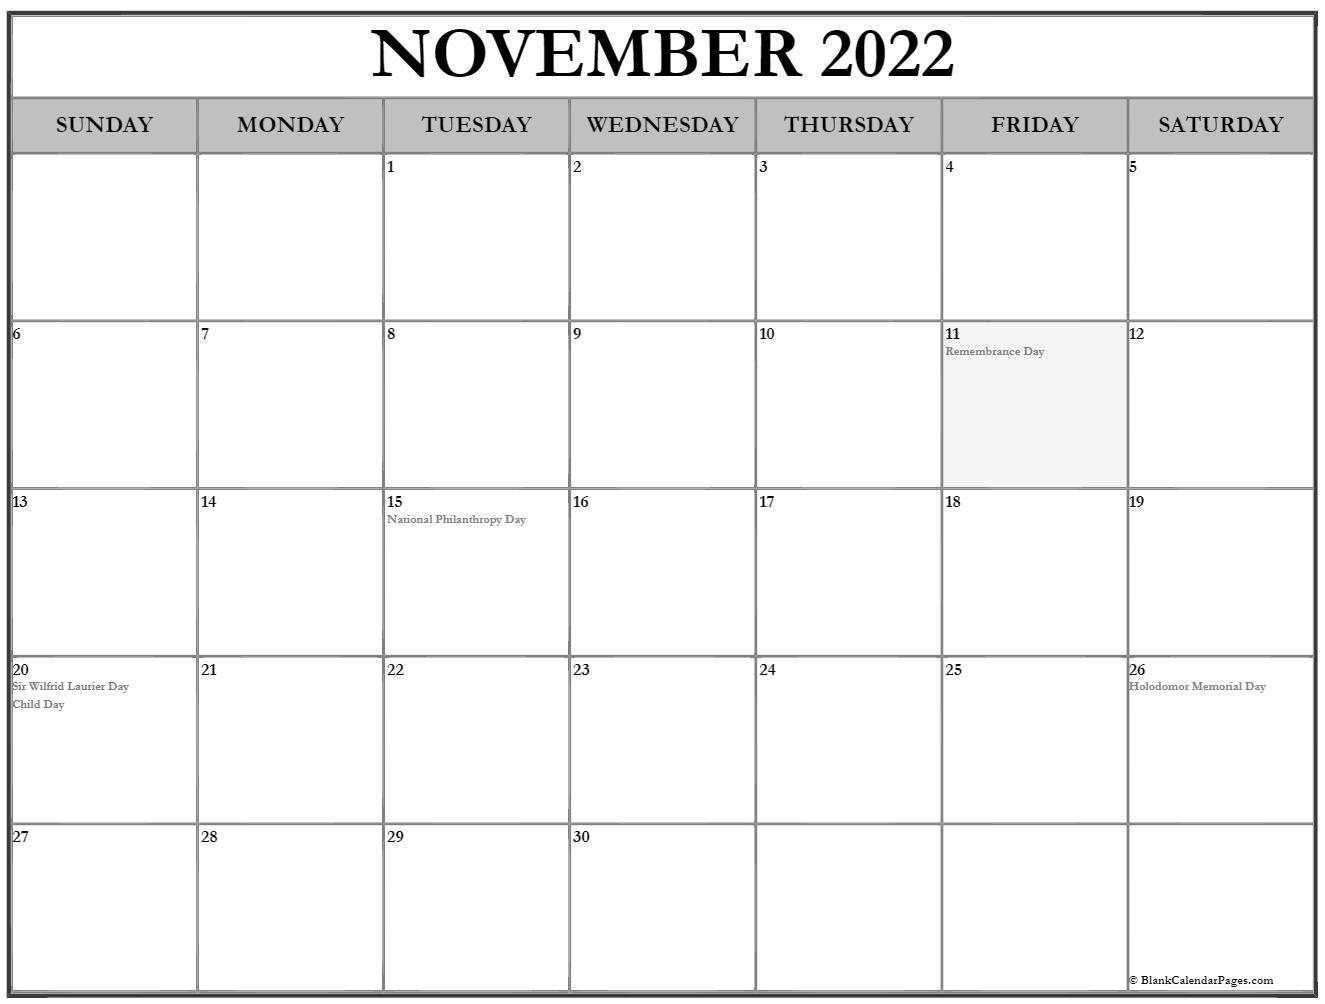 Month of November 2020 holidays Canada